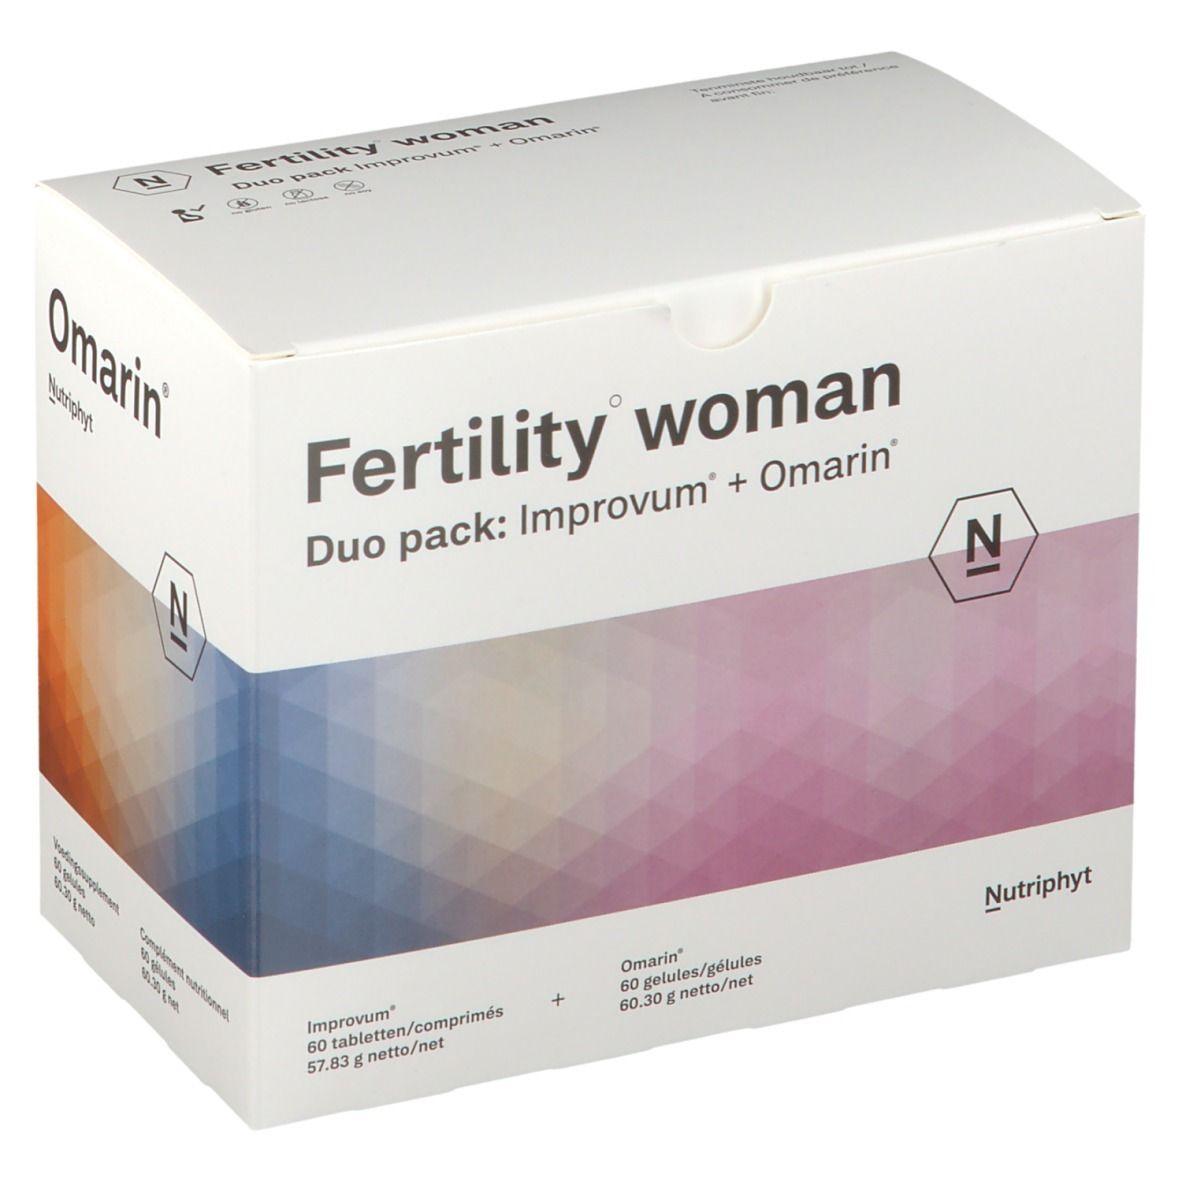 Fertility Woman Duo Omarin + Improve